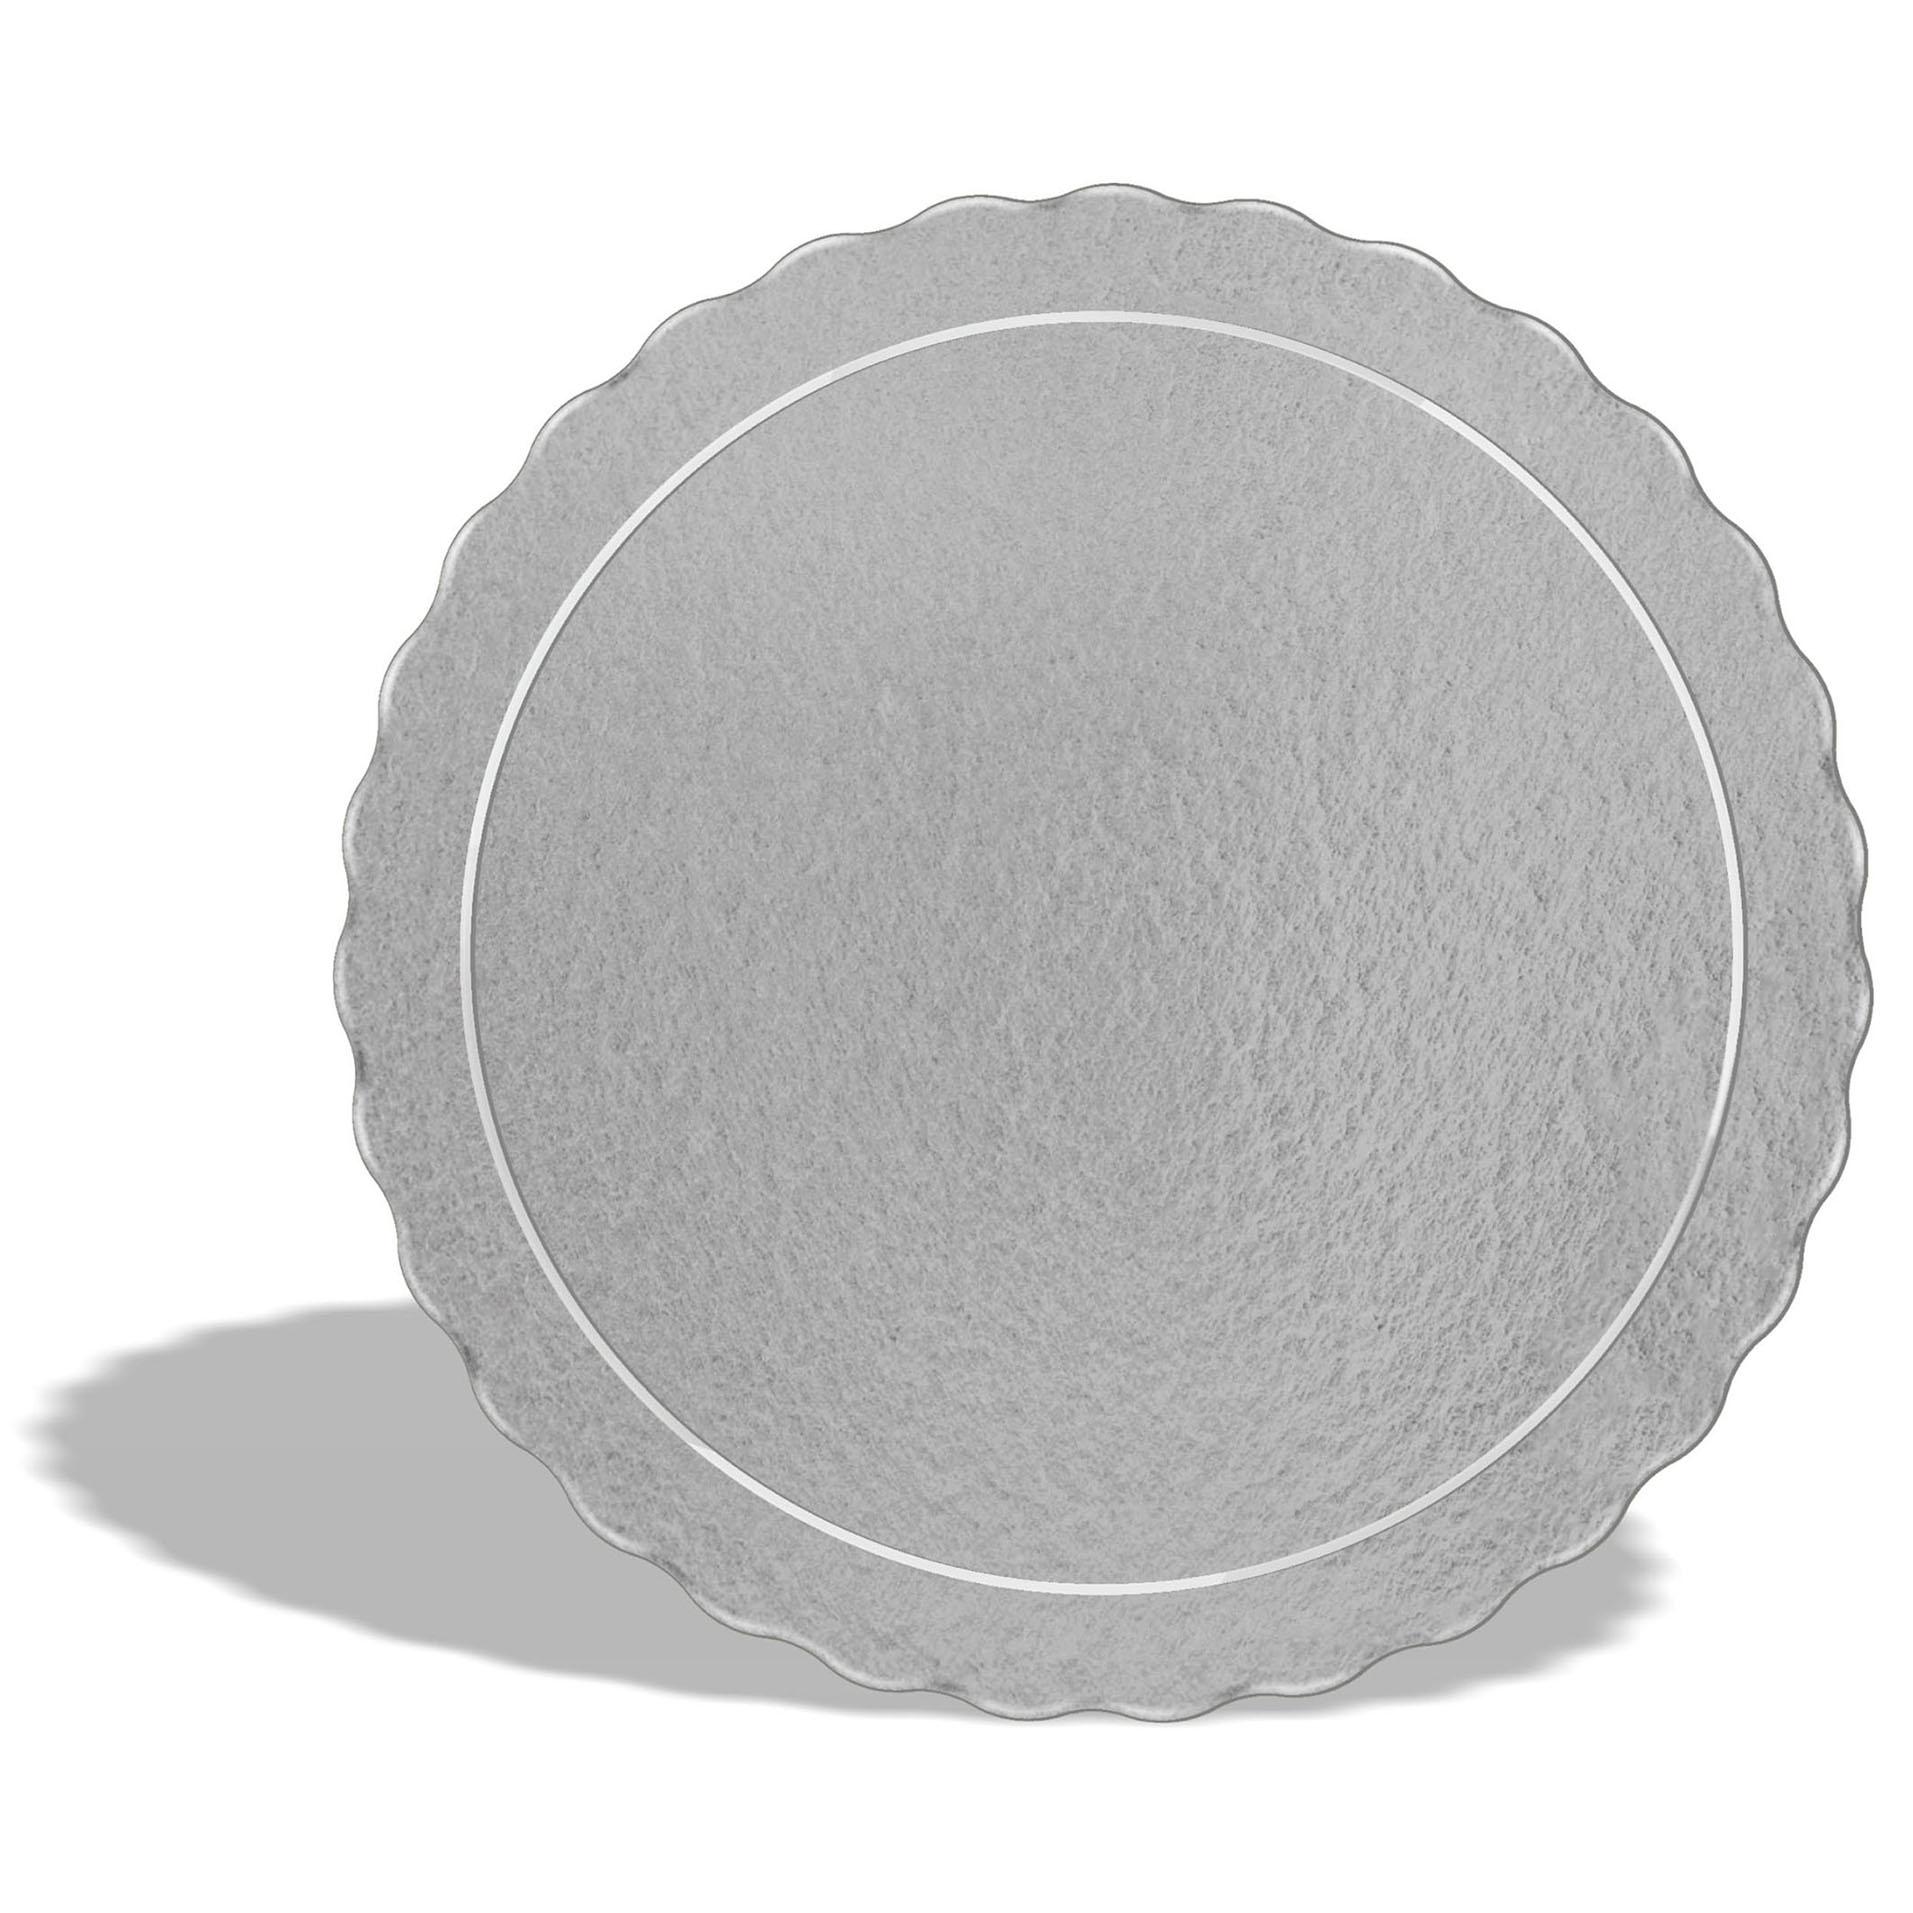 100 Bases Laminadas, Suporte P/ Bolo, Cake Board, 32cm - Prata